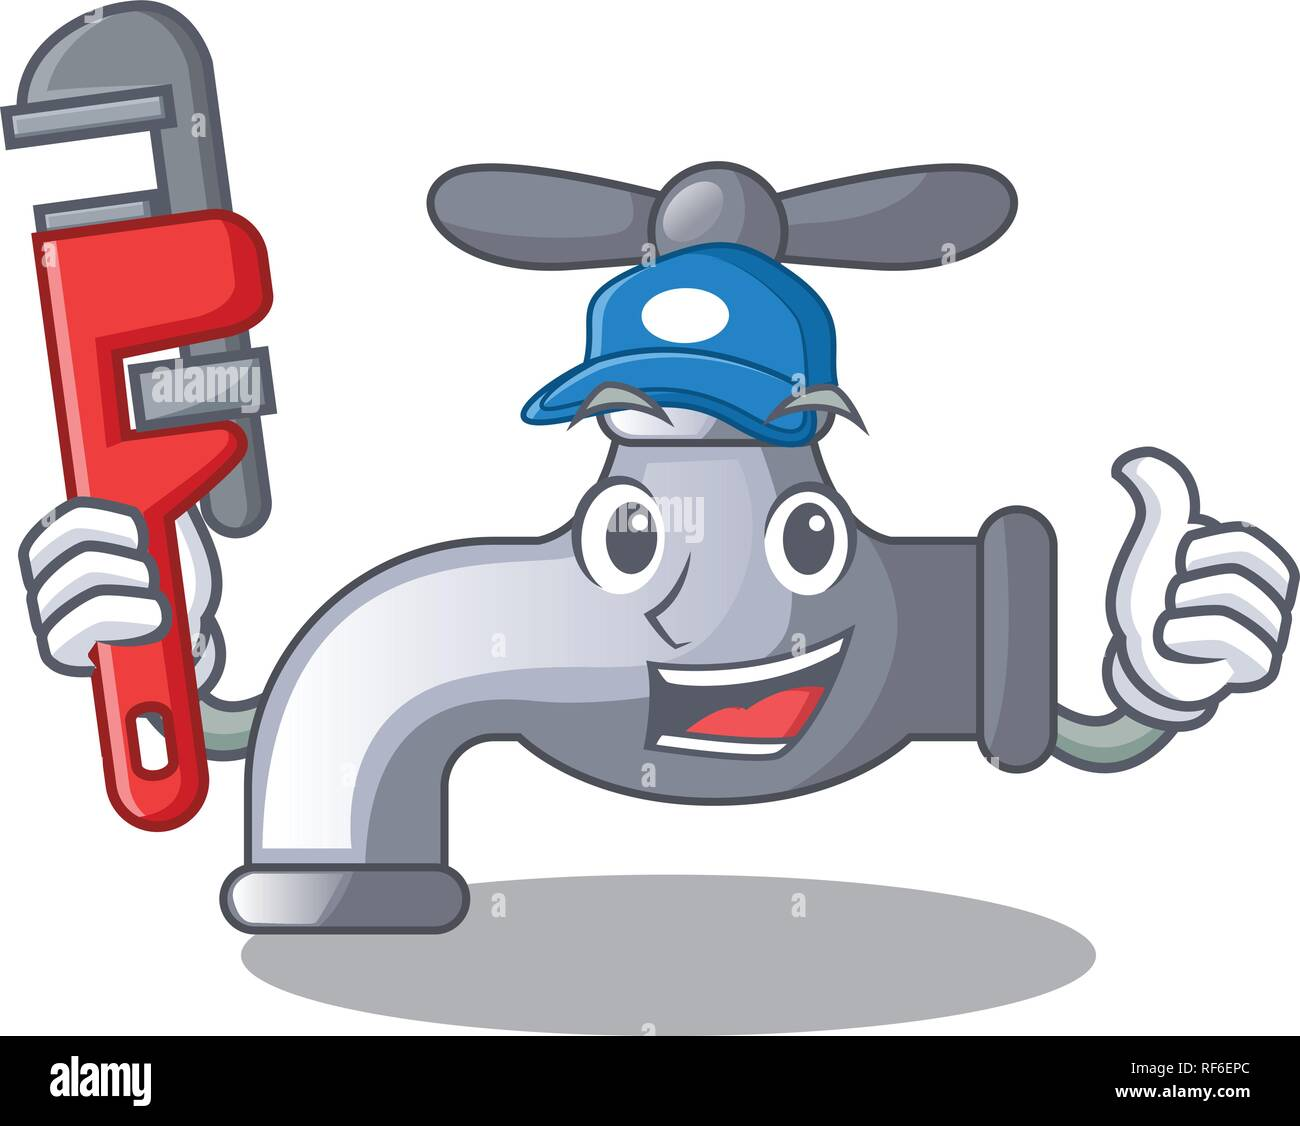 Plumber Water Tap In Shape Wooden Cartoon Stock Vector Image Art Alamy